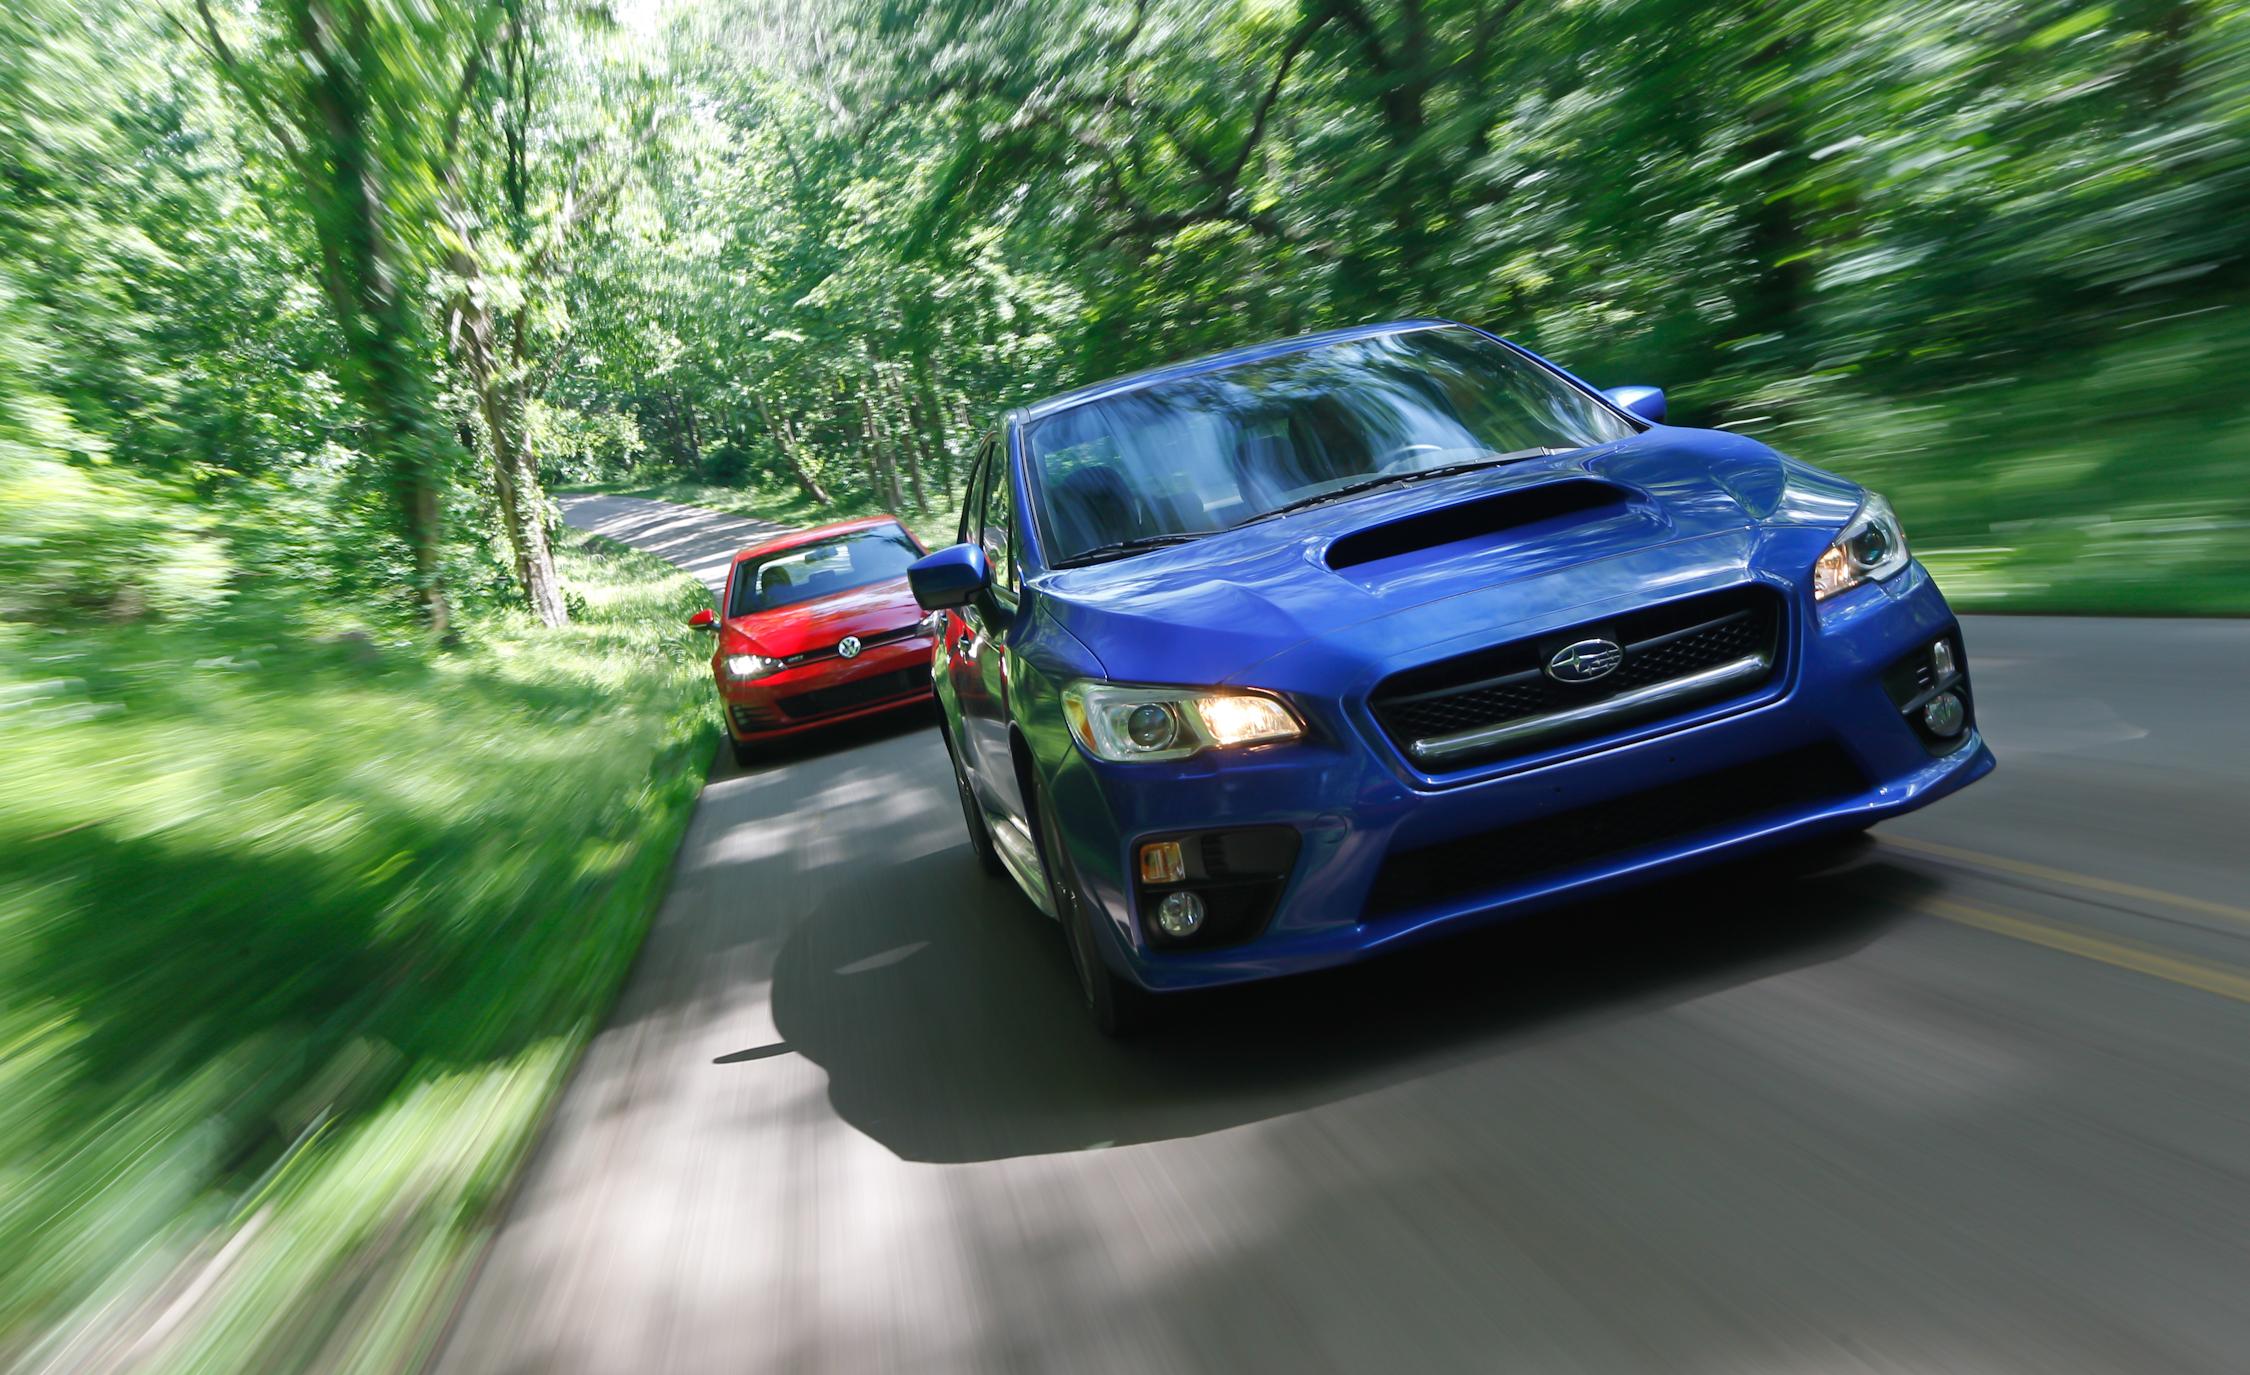 Front Design 2015 Subaru WRX vs 2015 Volkswagen GTI